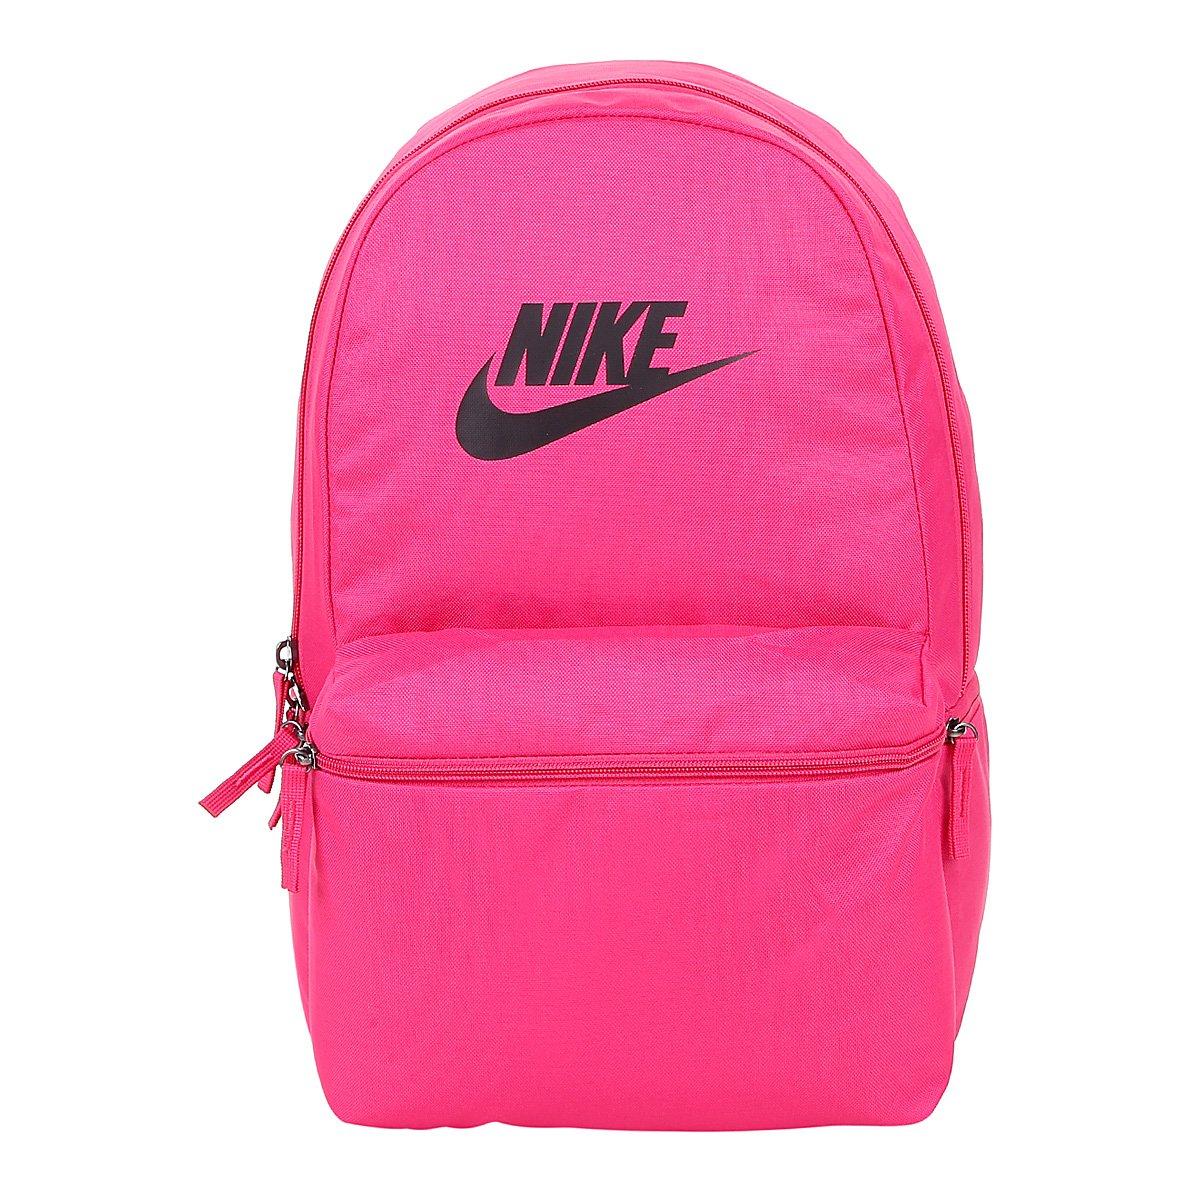 Nike Bkpk Nike Pink Mochila Mochila Heritage Mochila Heritage Pink Bkpk qUzVSMp